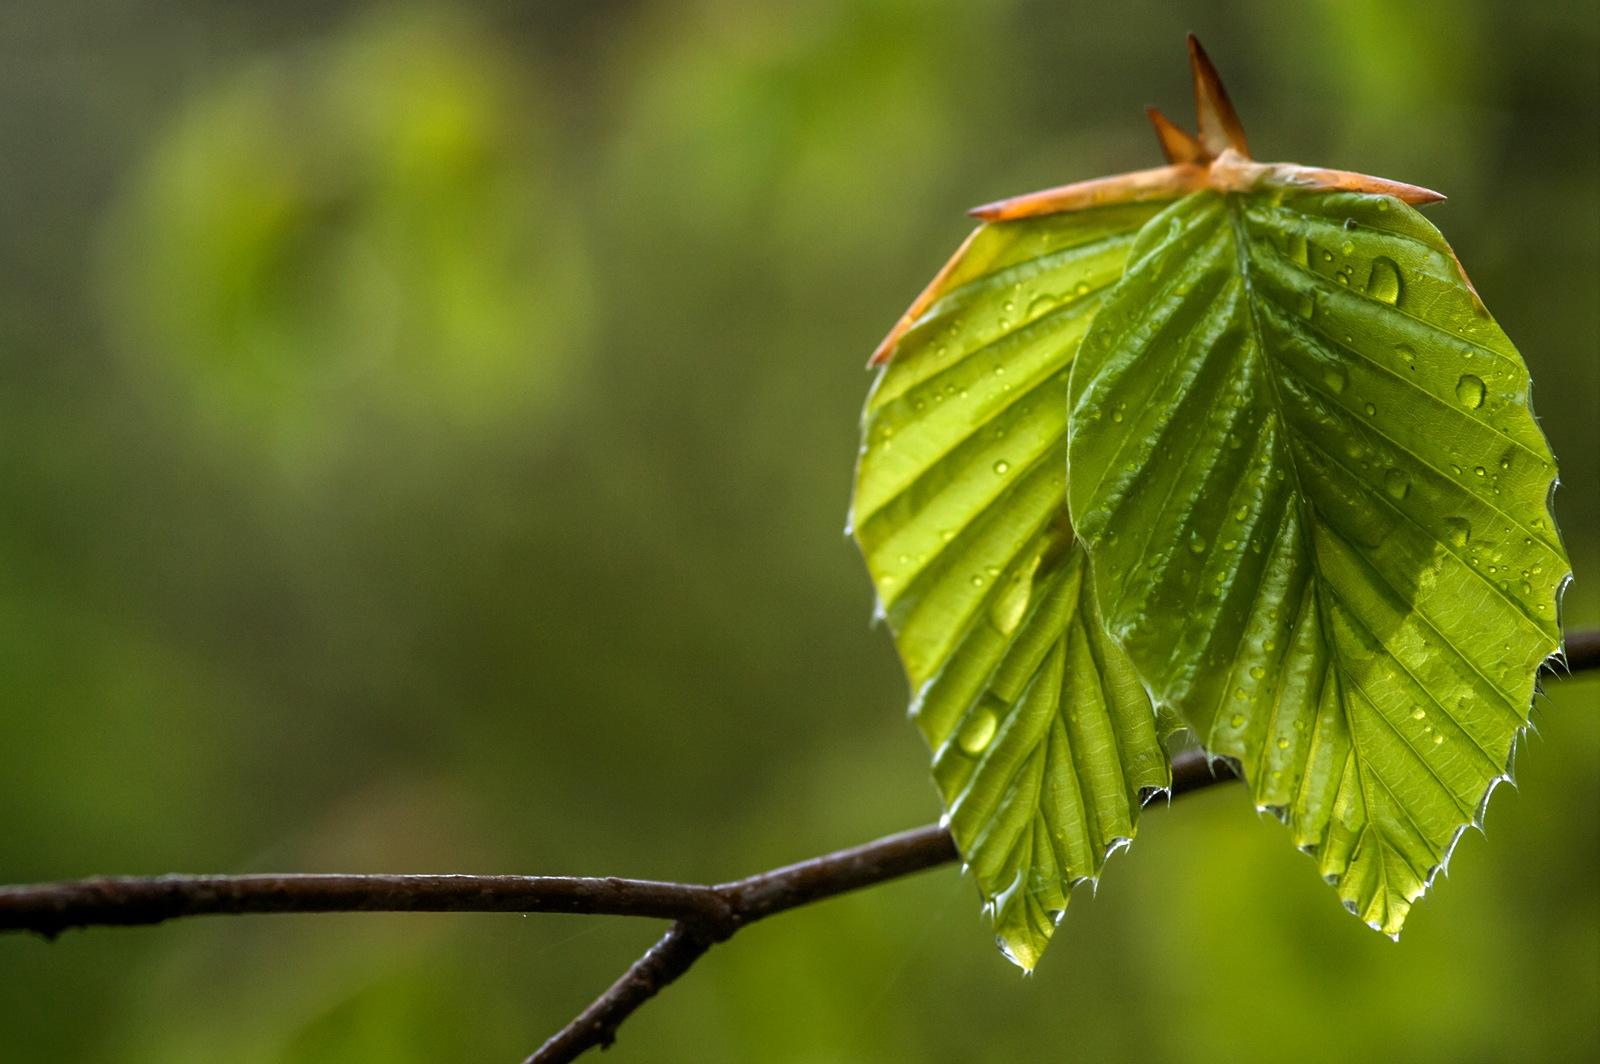 Rainy by karlvock